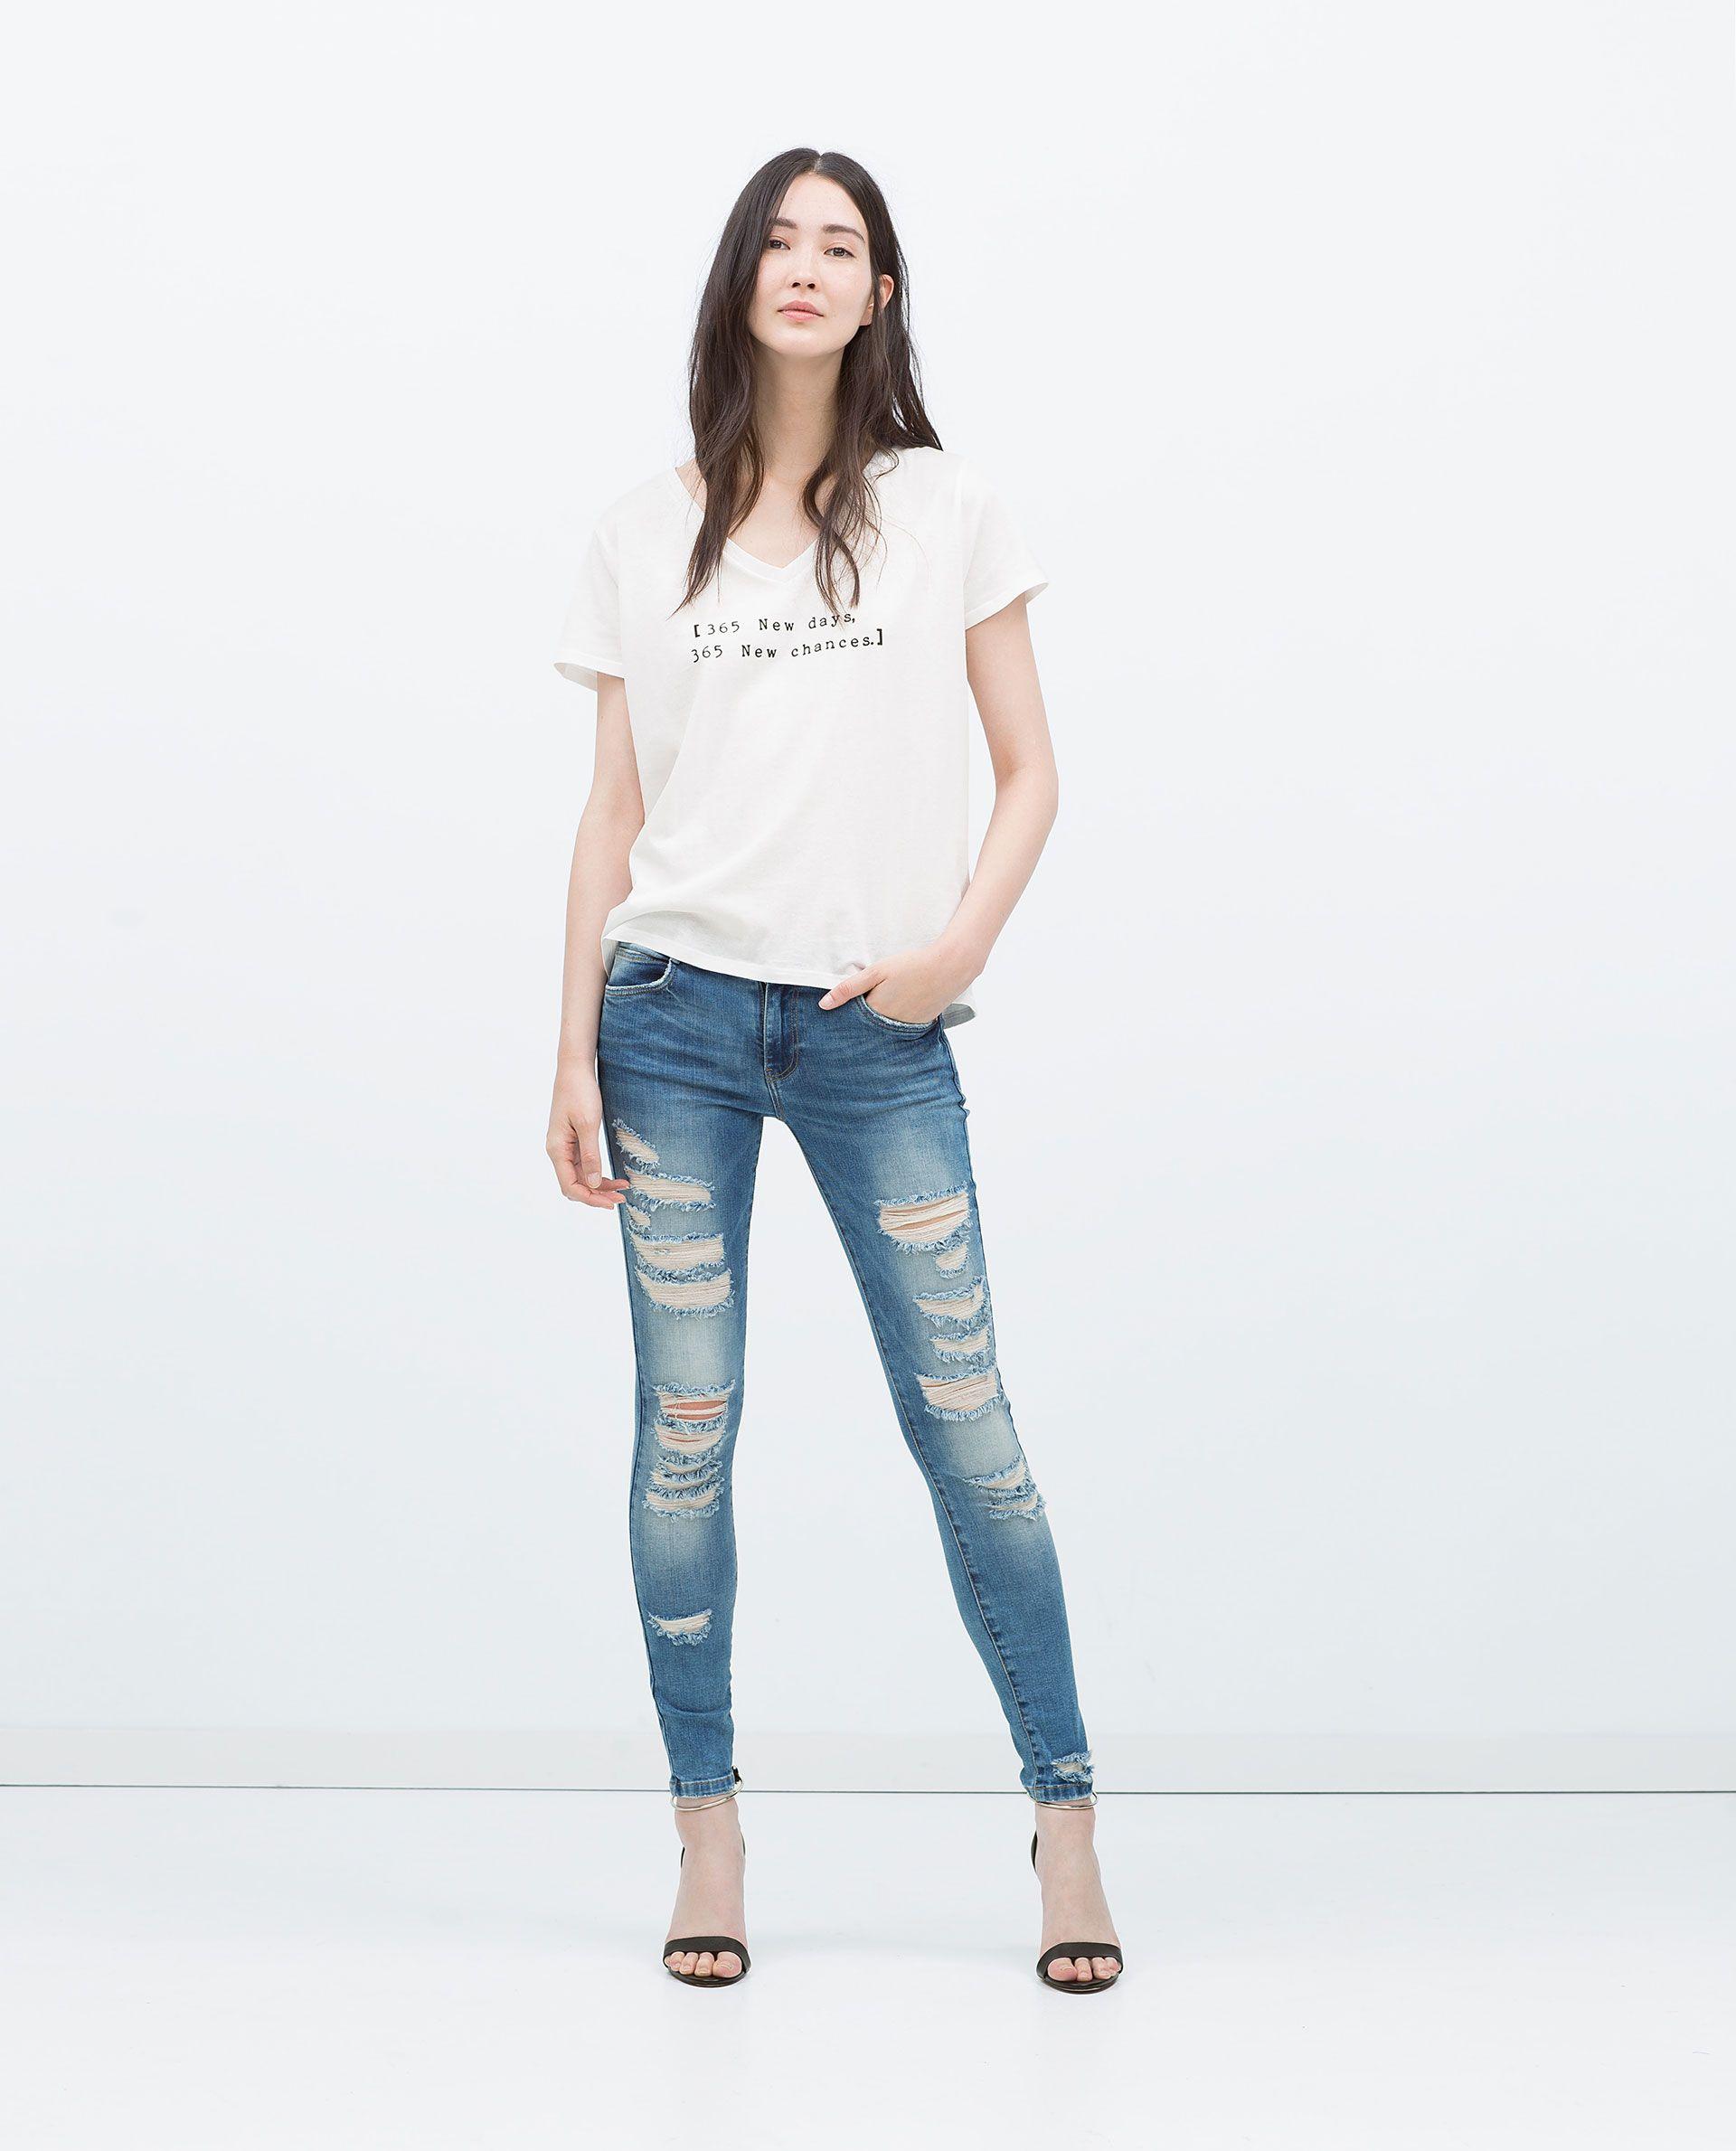 802bad74ae ZARA - MUJER - PANTALÓN ROTOS Zara Mujer Pantalones